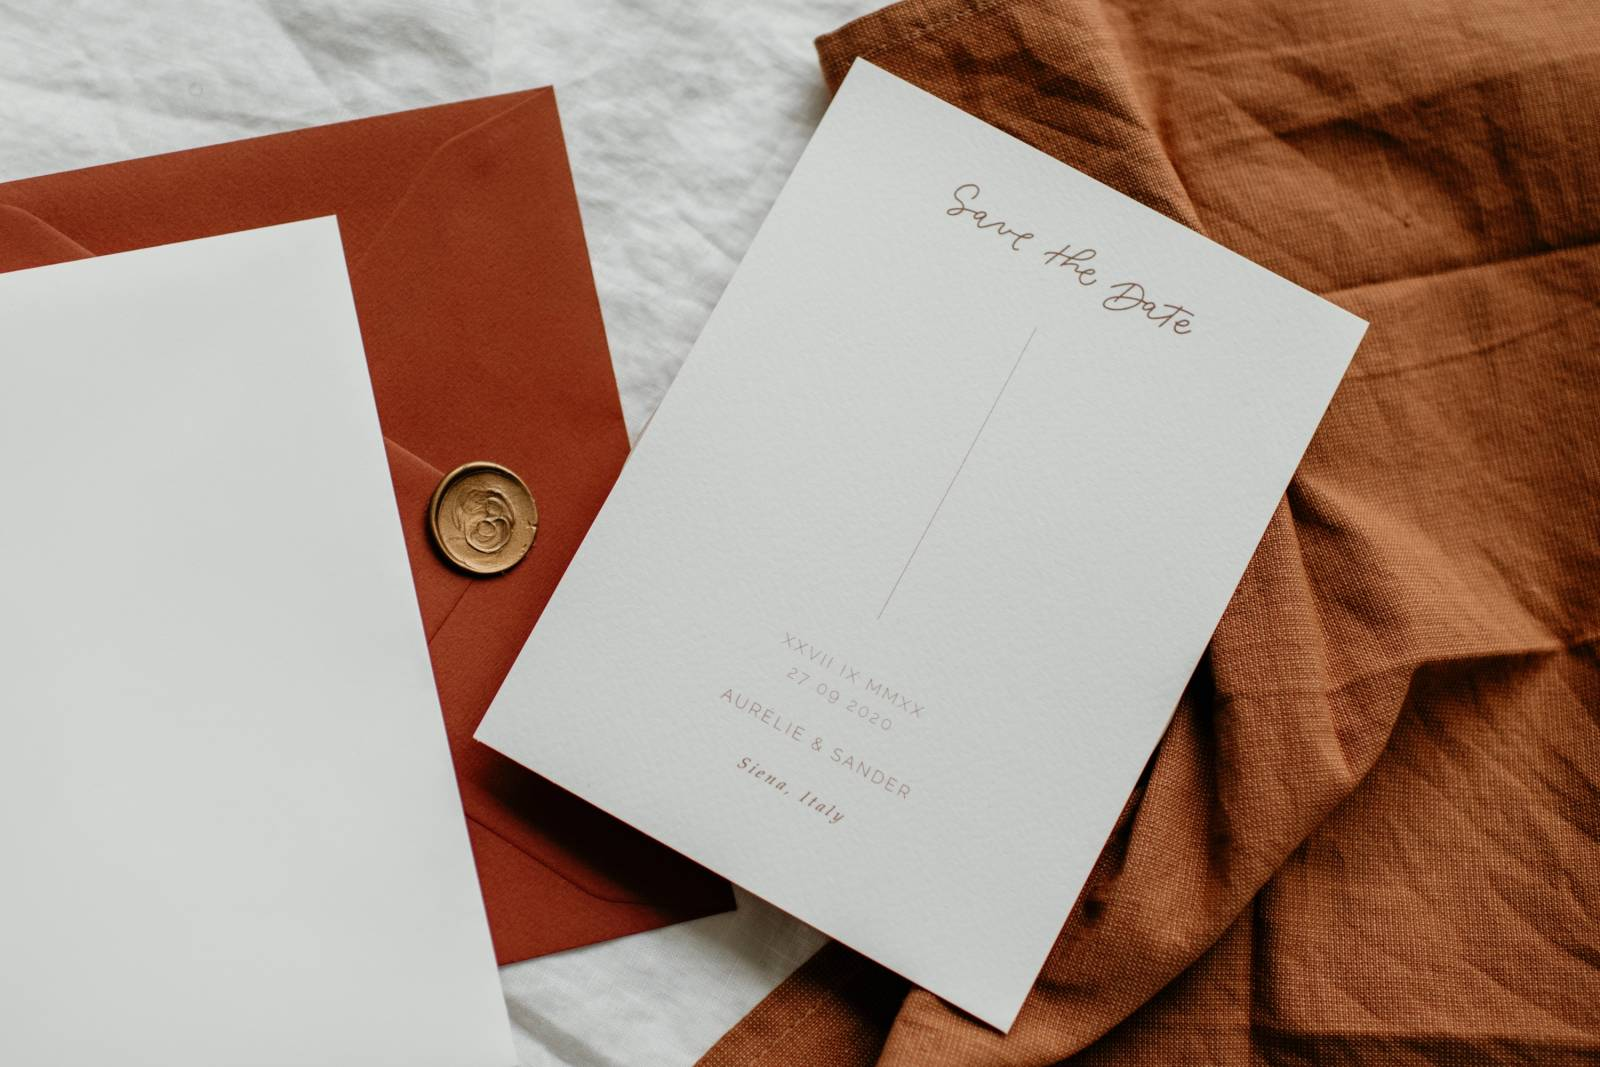 Touch of Gold - Trouwuitnodiging - Huwelijksuitnodiging - Kalligrafie - House of Weddings - 29